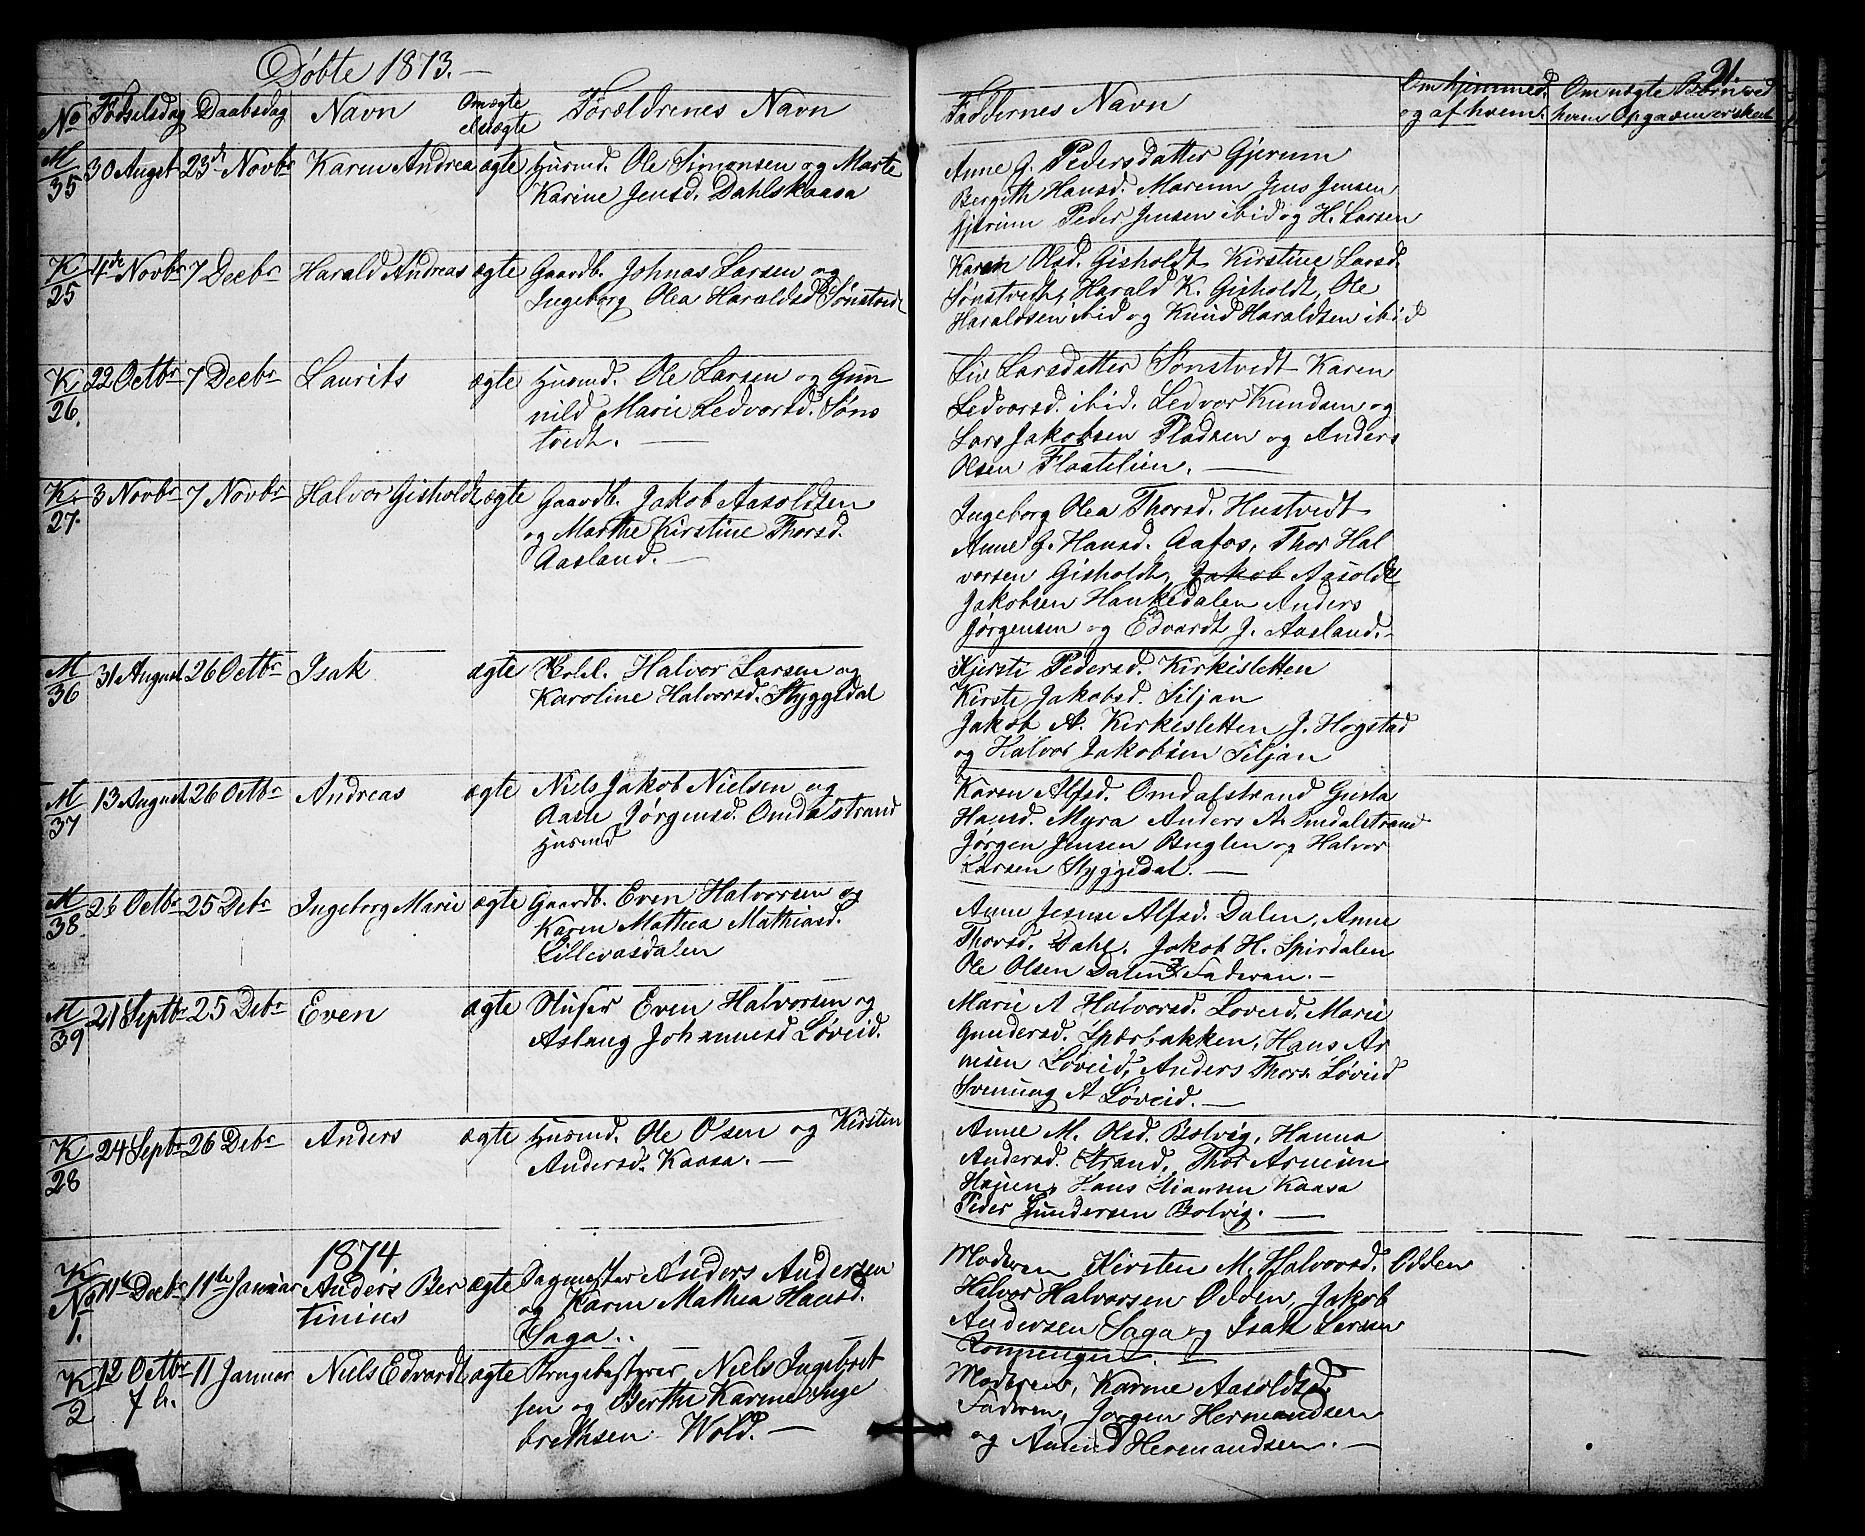 SAKO, Solum kirkebøker, G/Gb/L0002: Klokkerbok nr. II 2, 1859-1879, s. 91